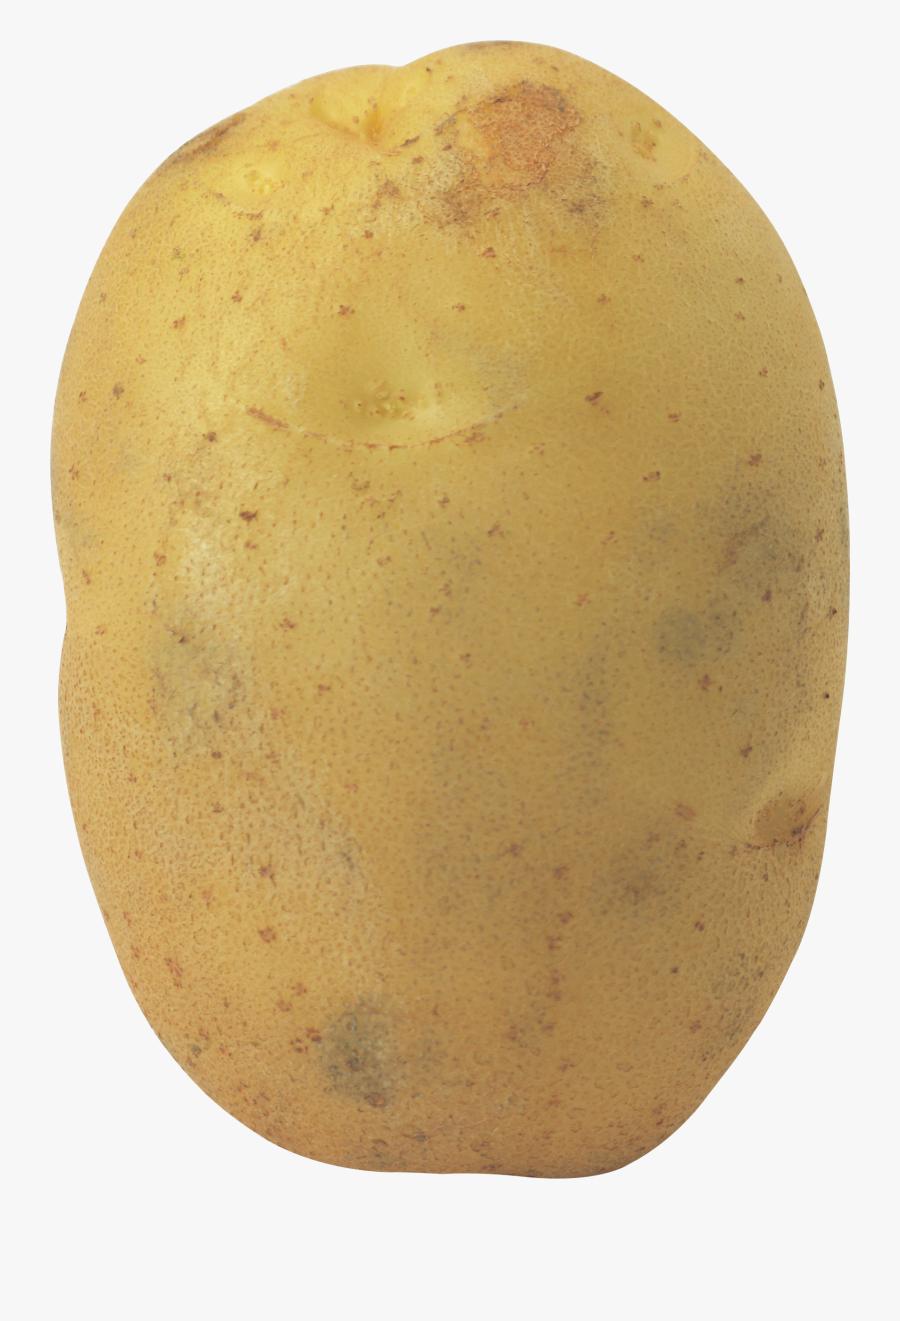 Transparent Potato White Background, Transparent Clipart